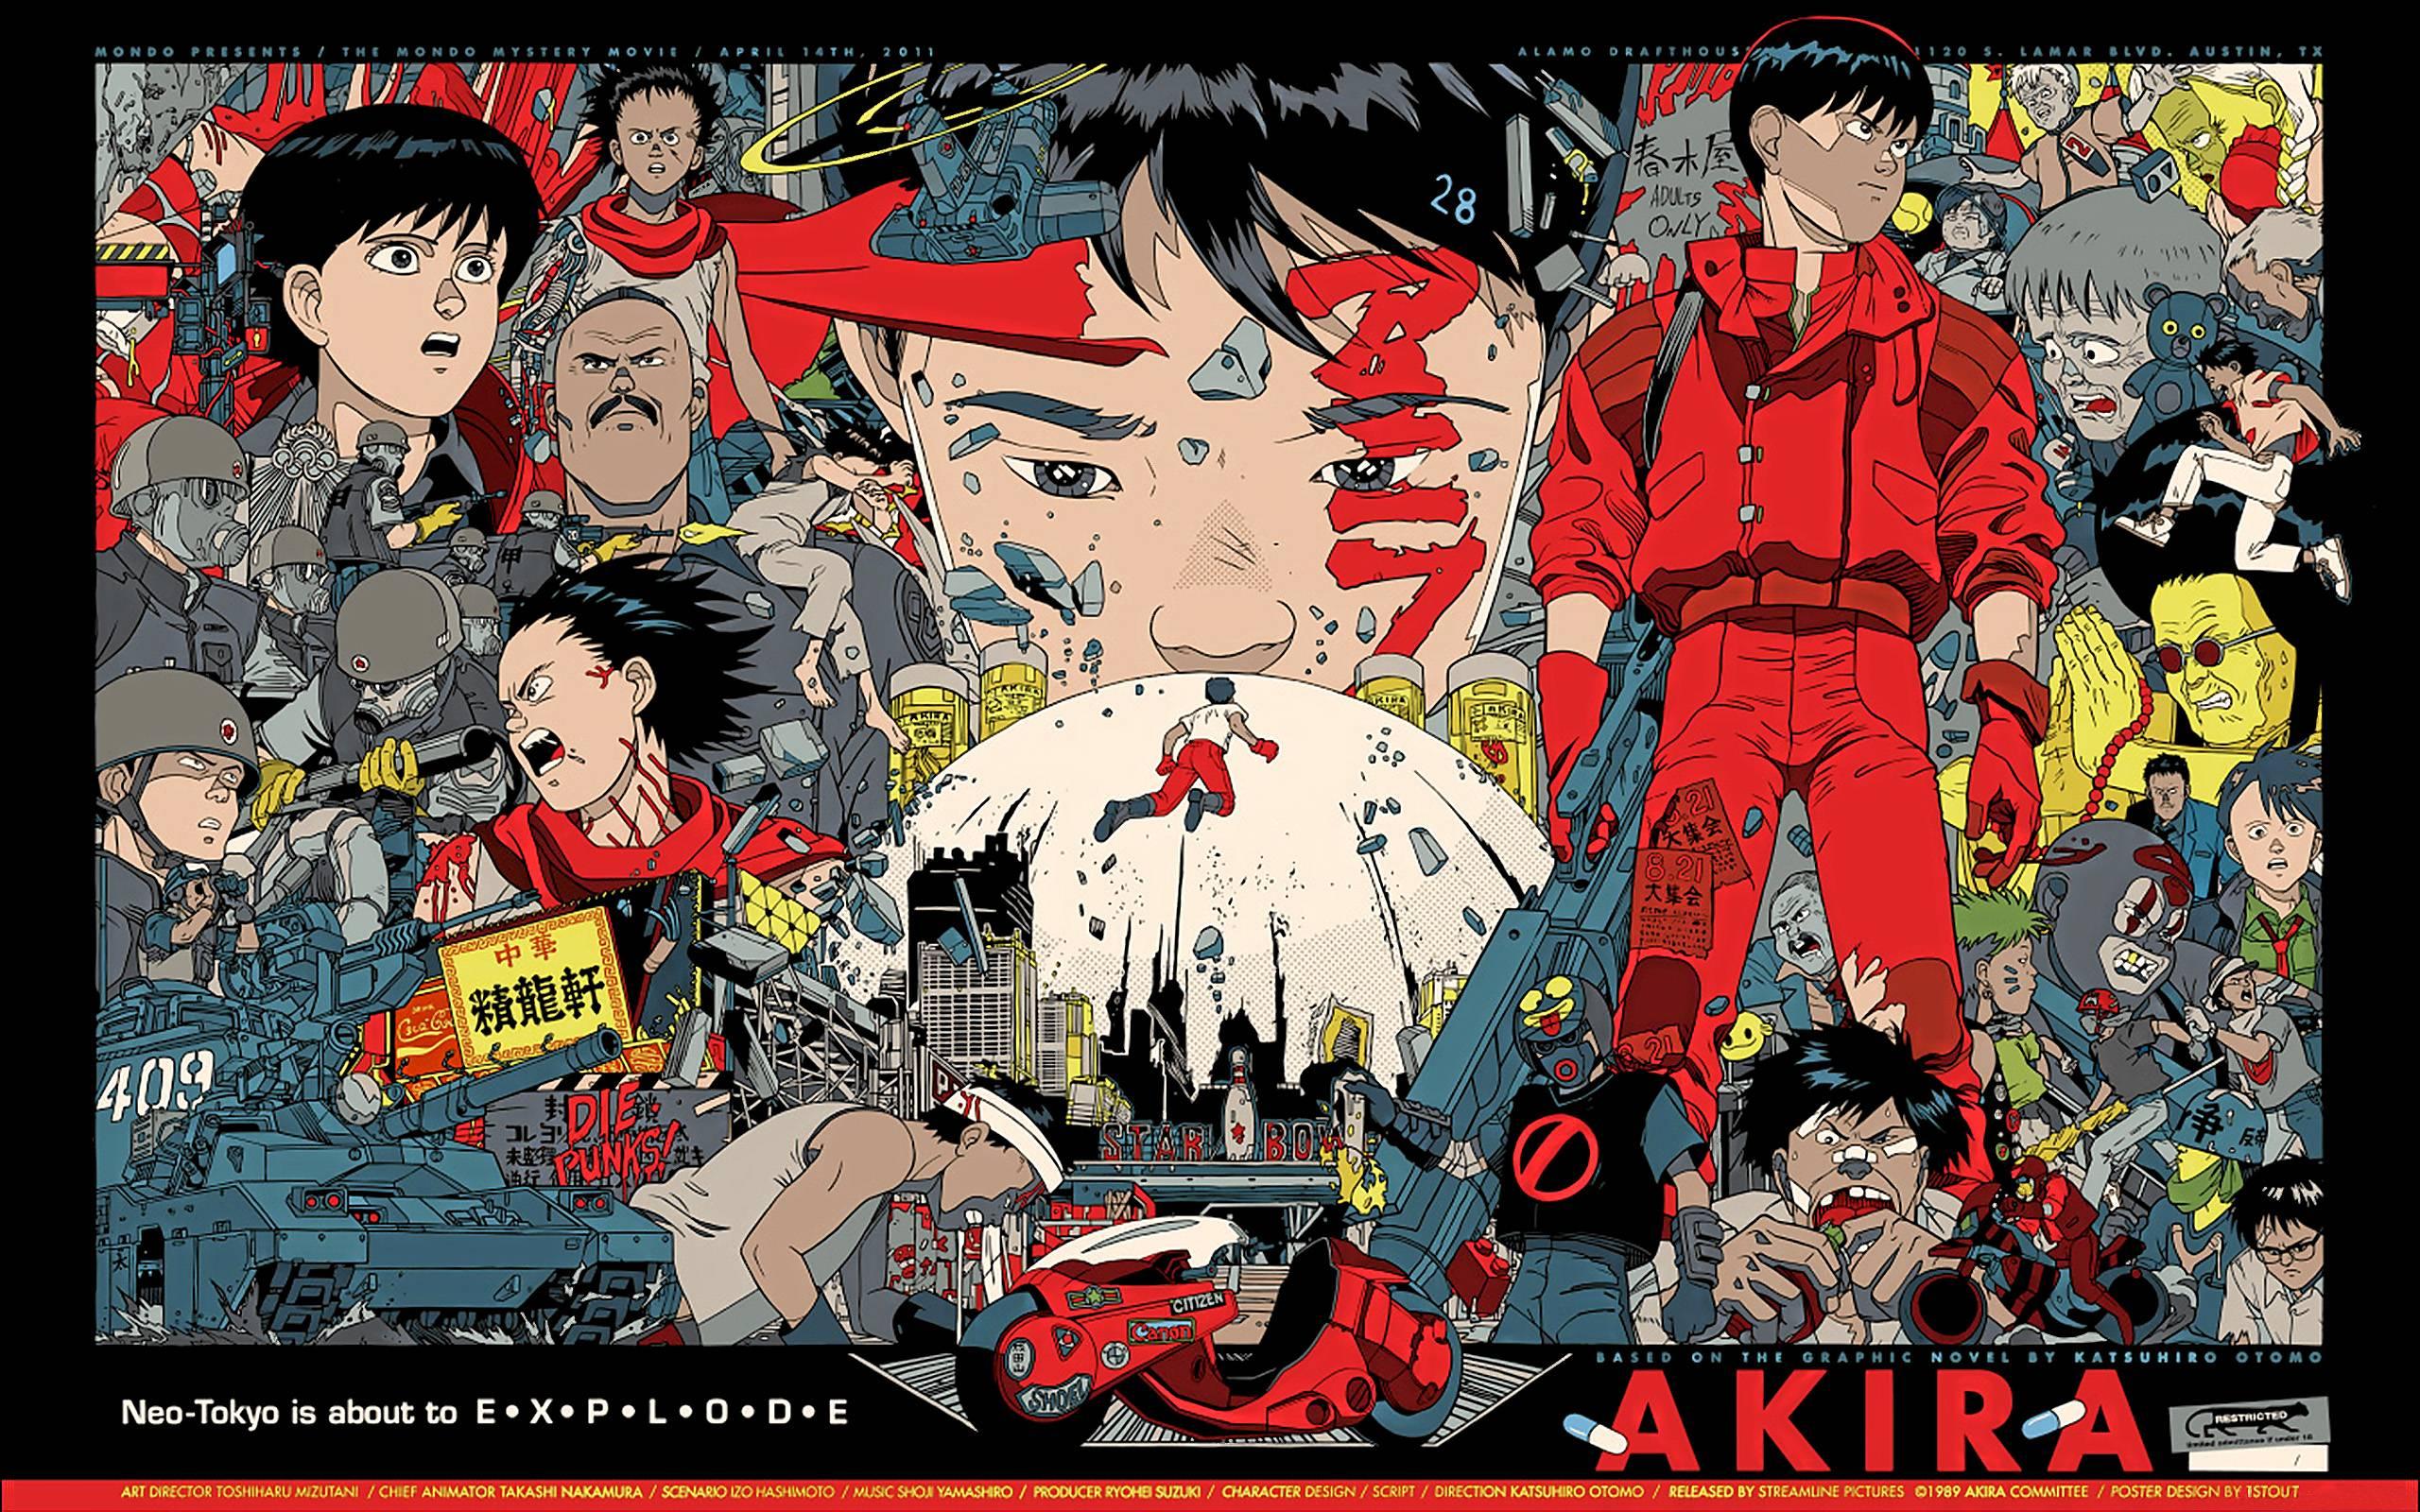 akira wallpaper forwallpapercom - photo #14